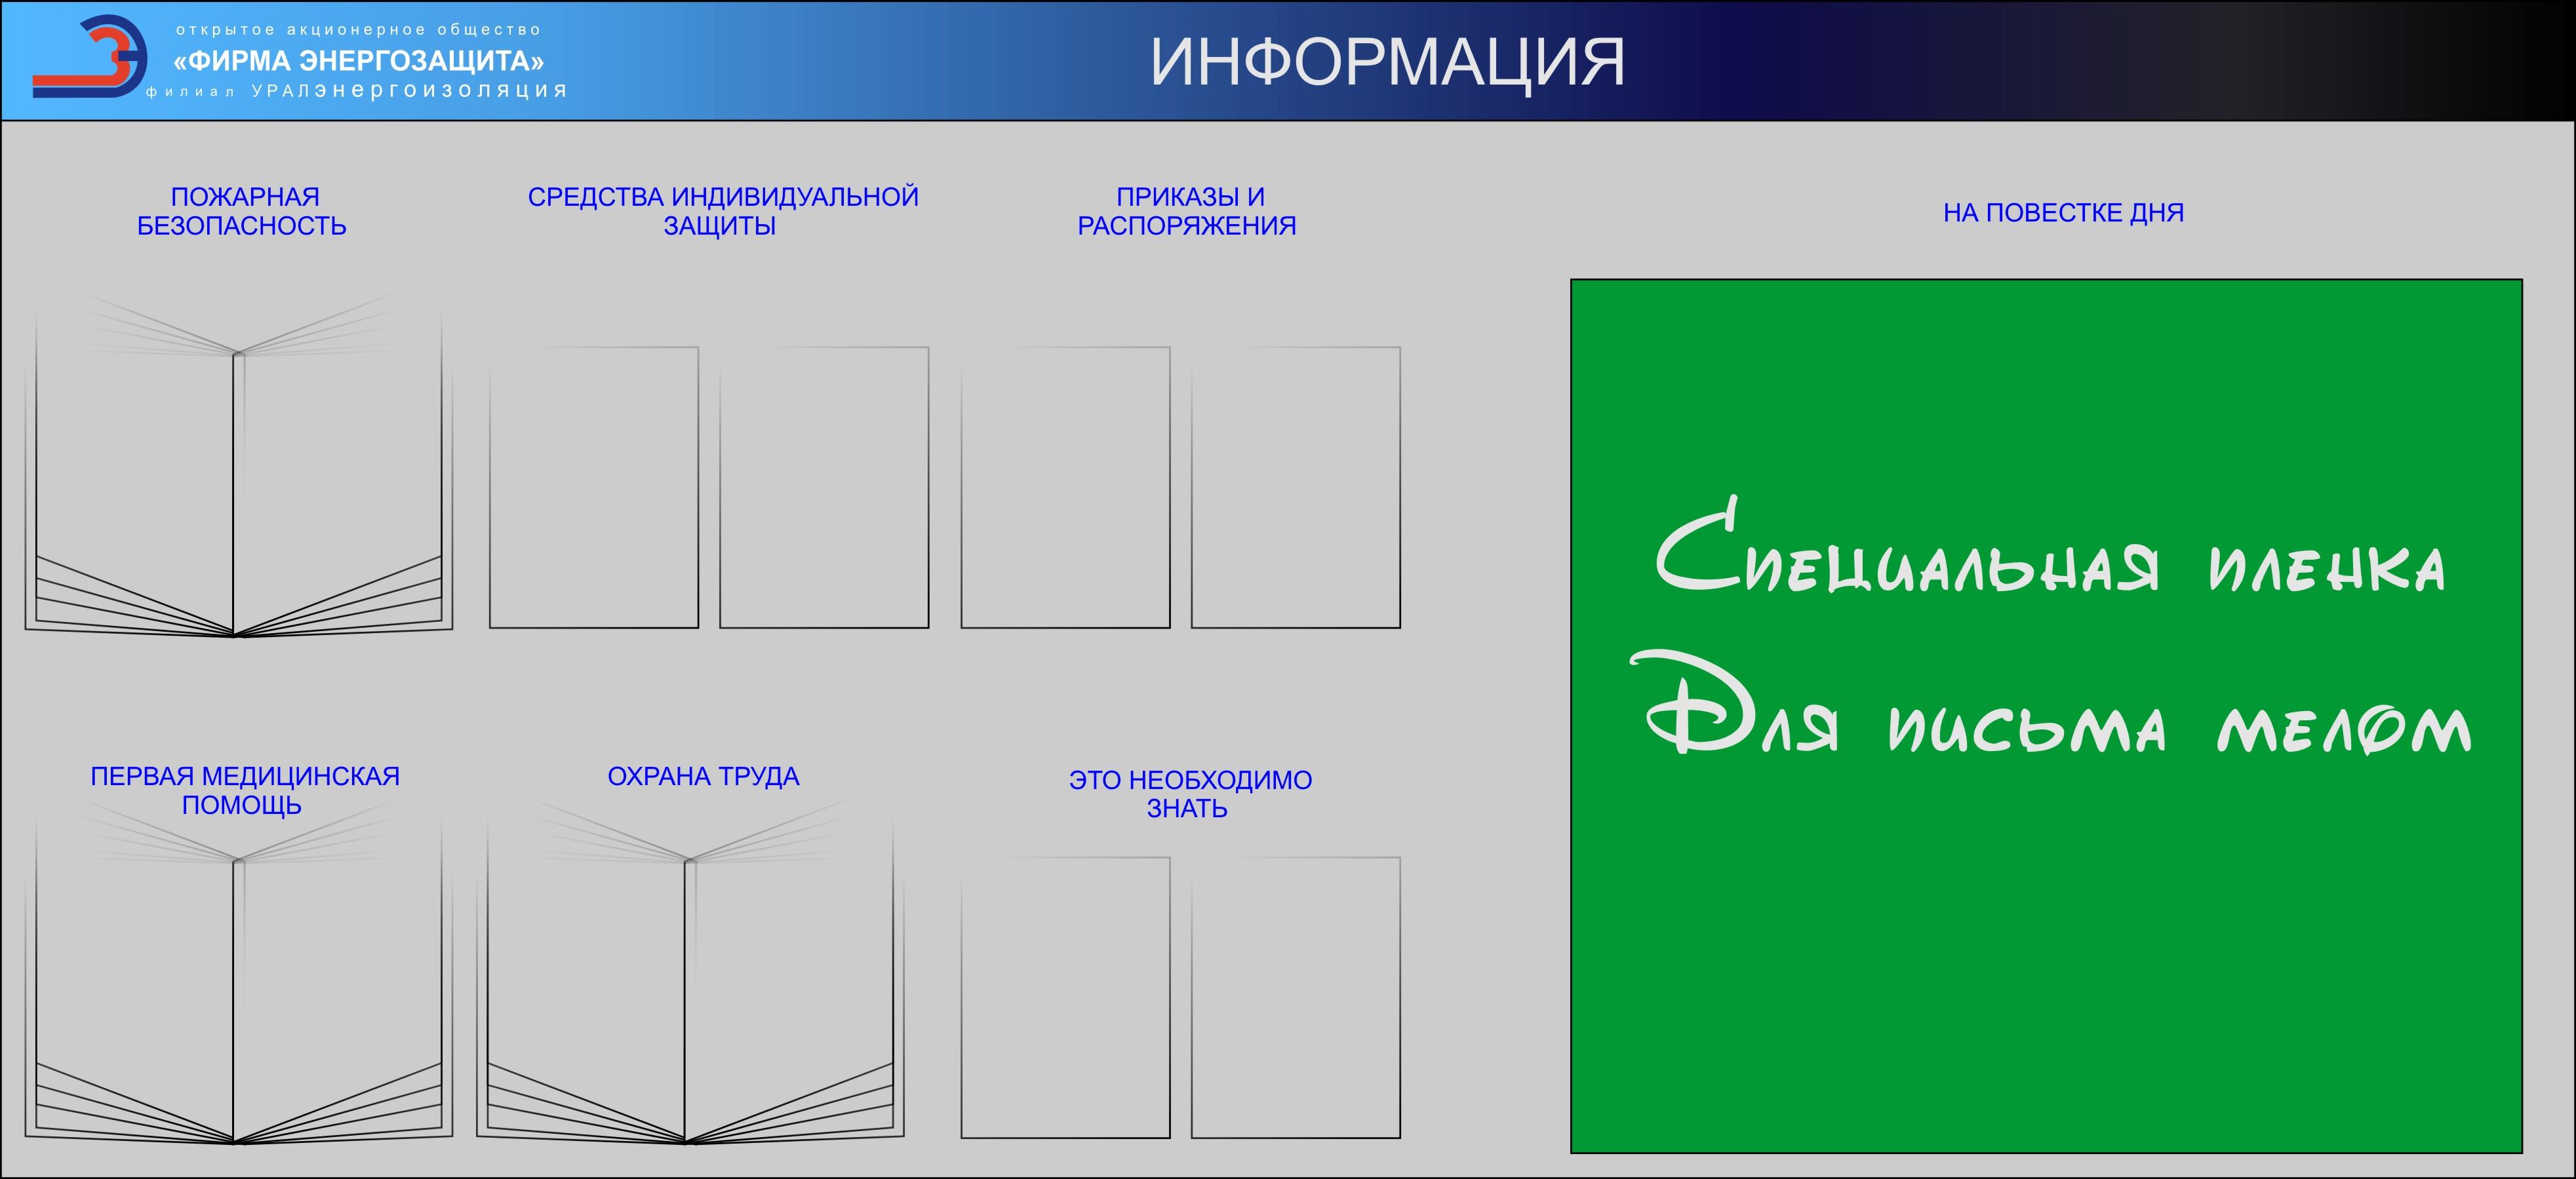 Стенд по ТБ.jpg